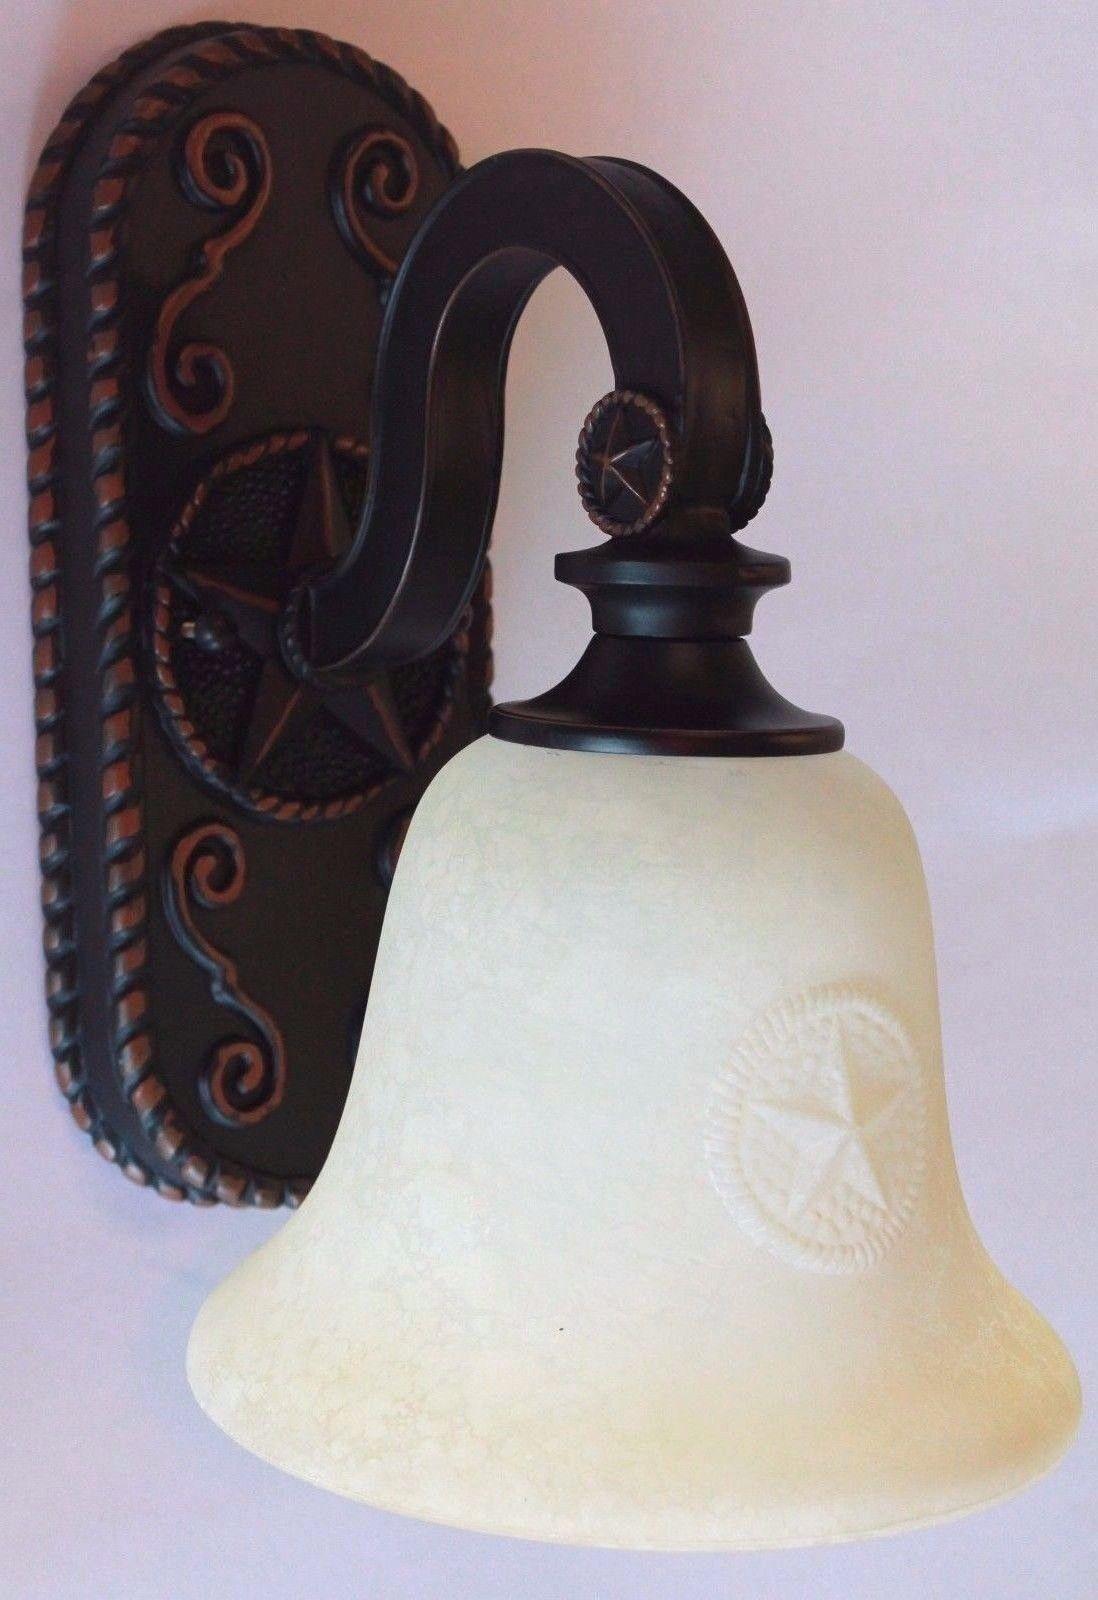 Texas Star Motif Collection Sconce Light Fixture Chaparral